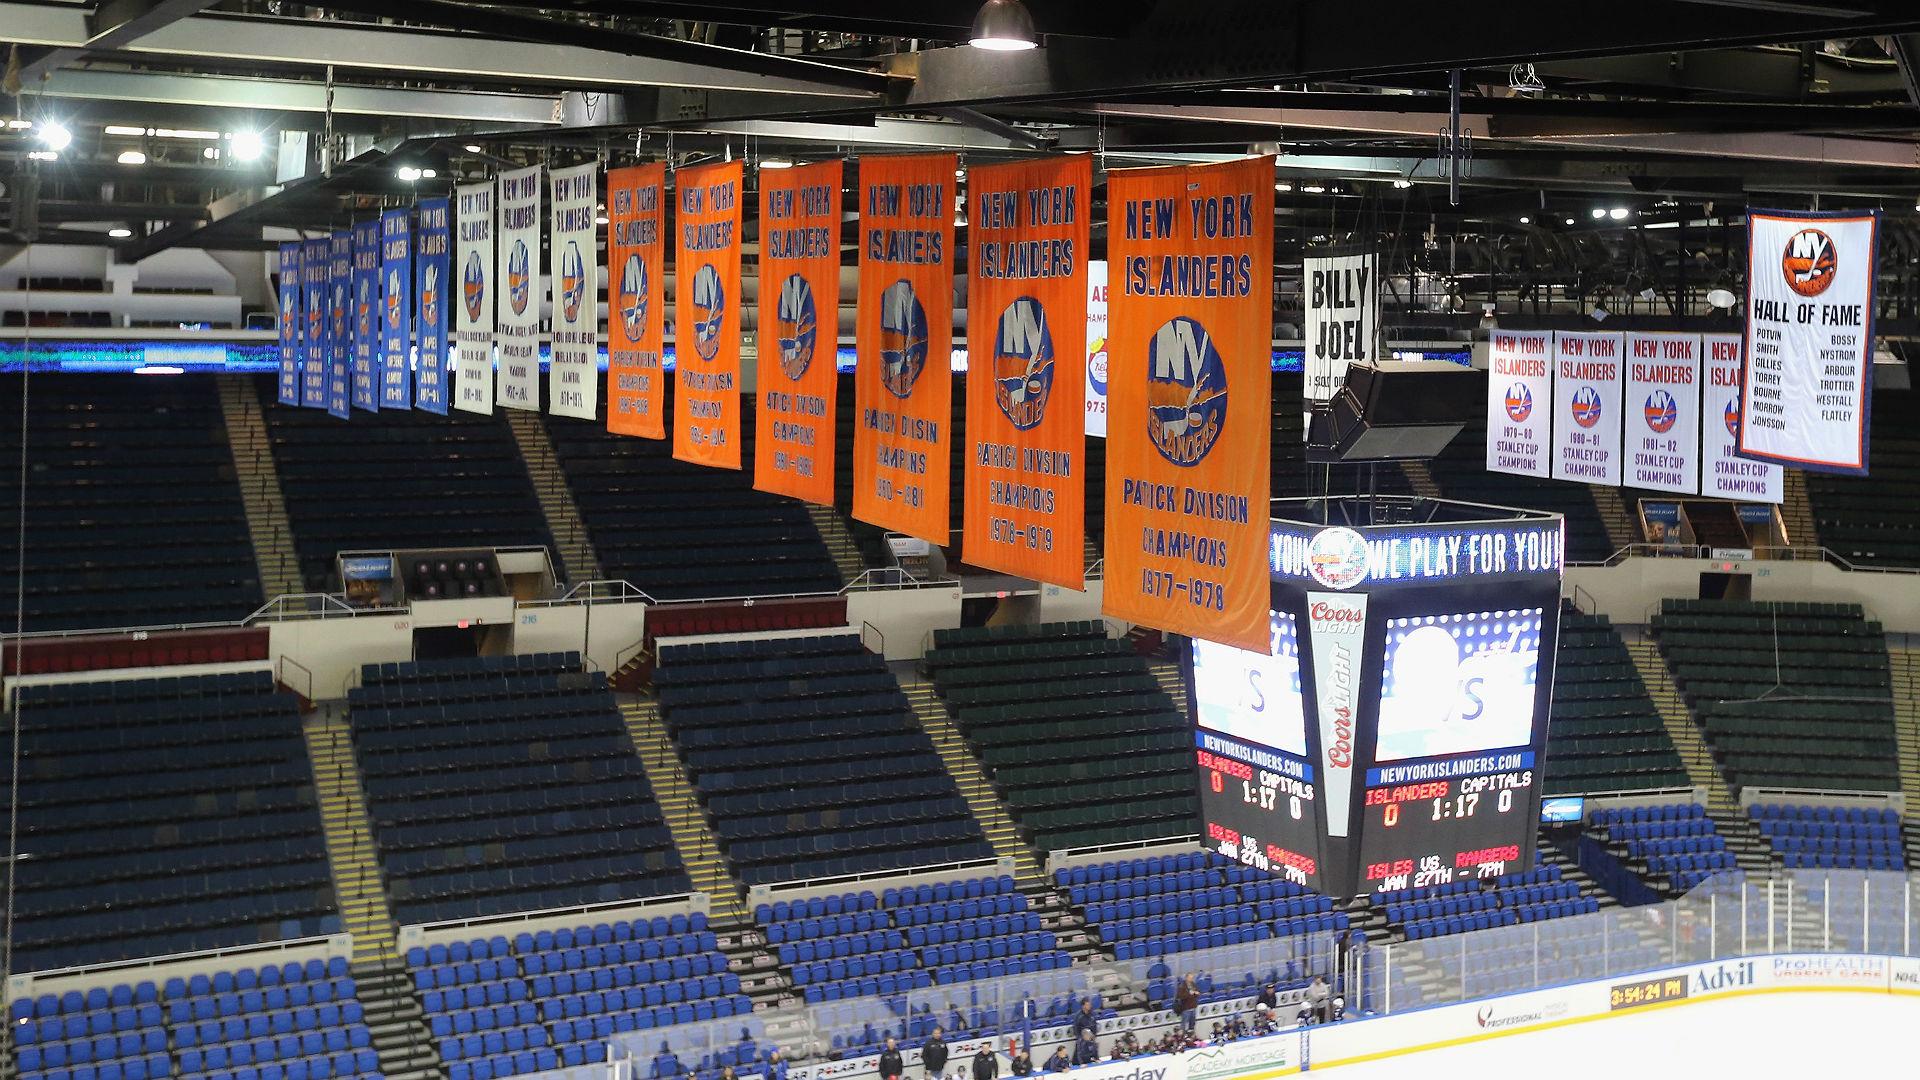 New York Islanders Looking to Play Games at Nassau Coliseum